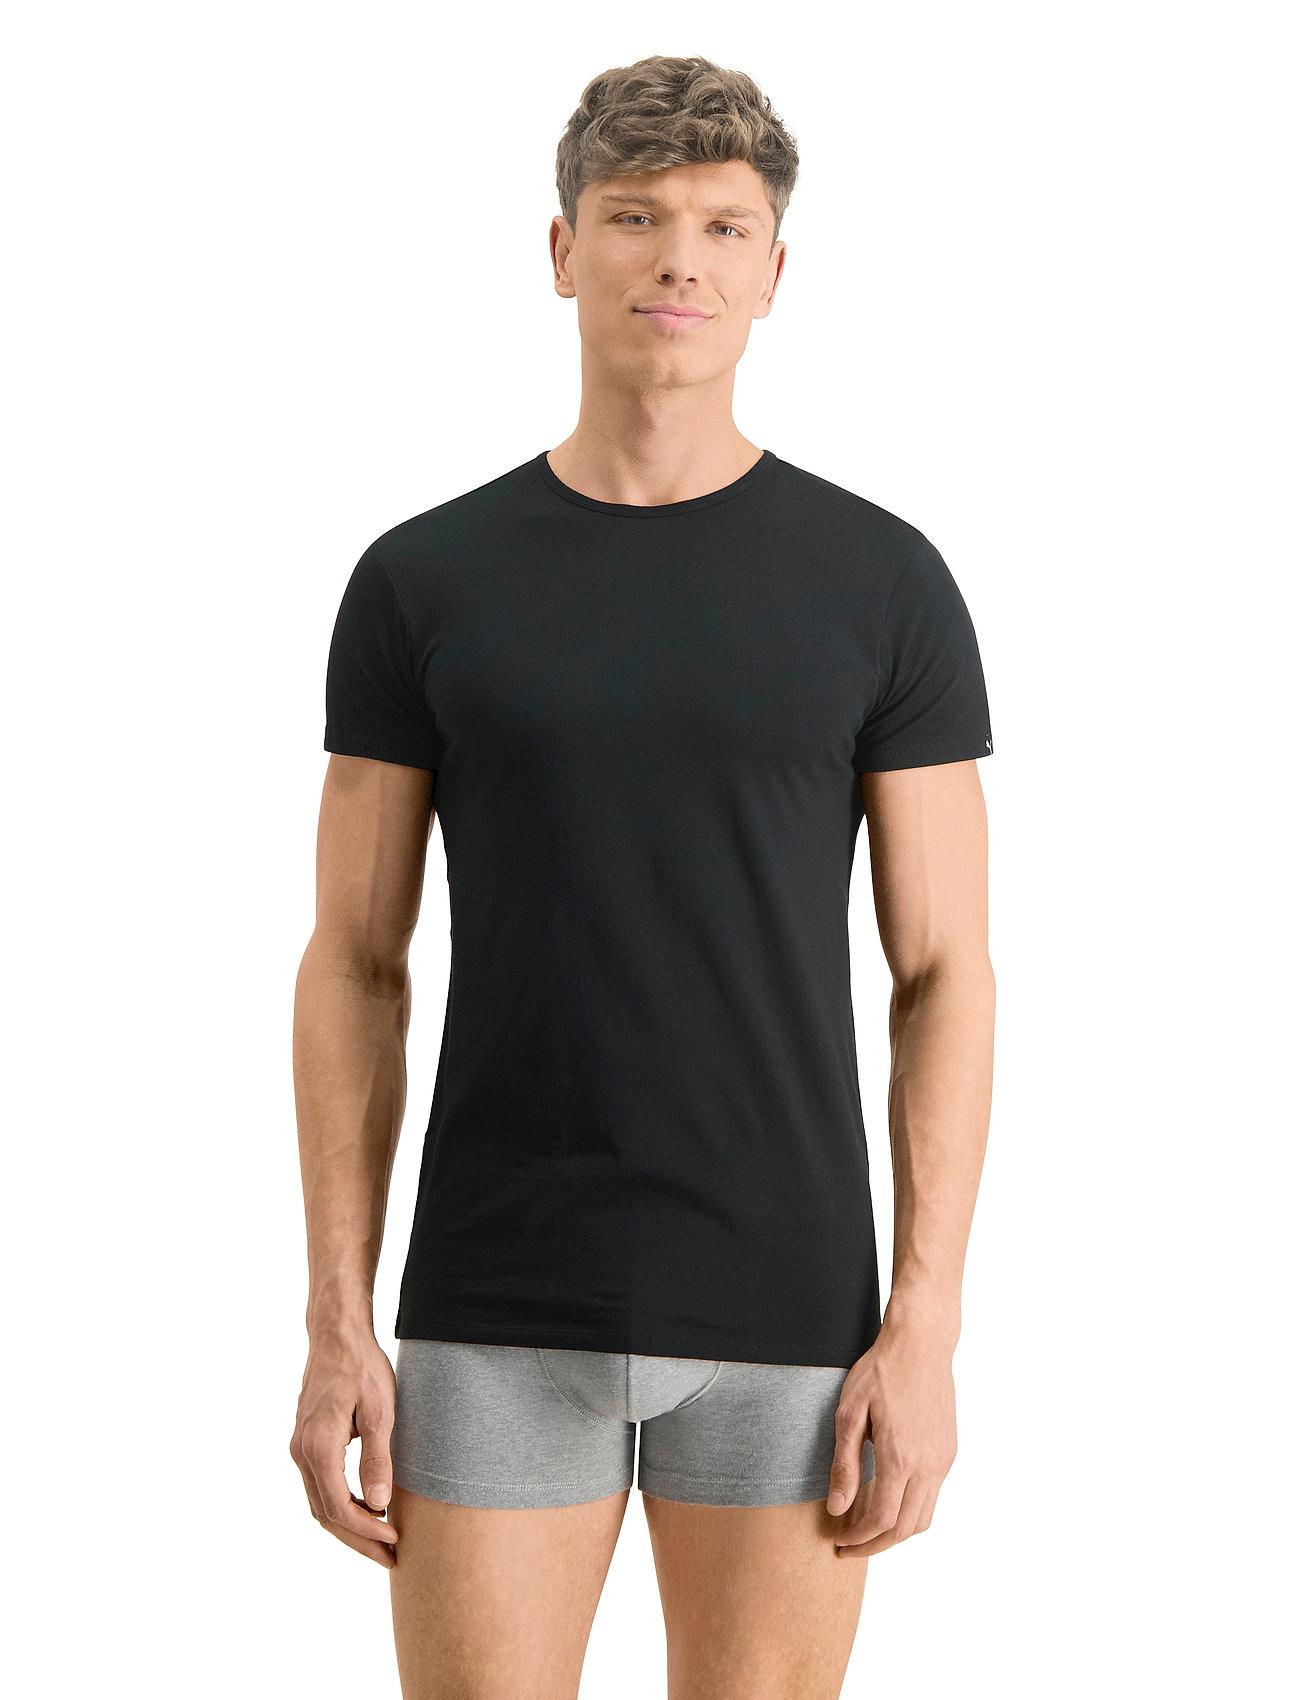 PUMA - PUMA BASIC 2P CREW TEE - t-shirts - black - 0